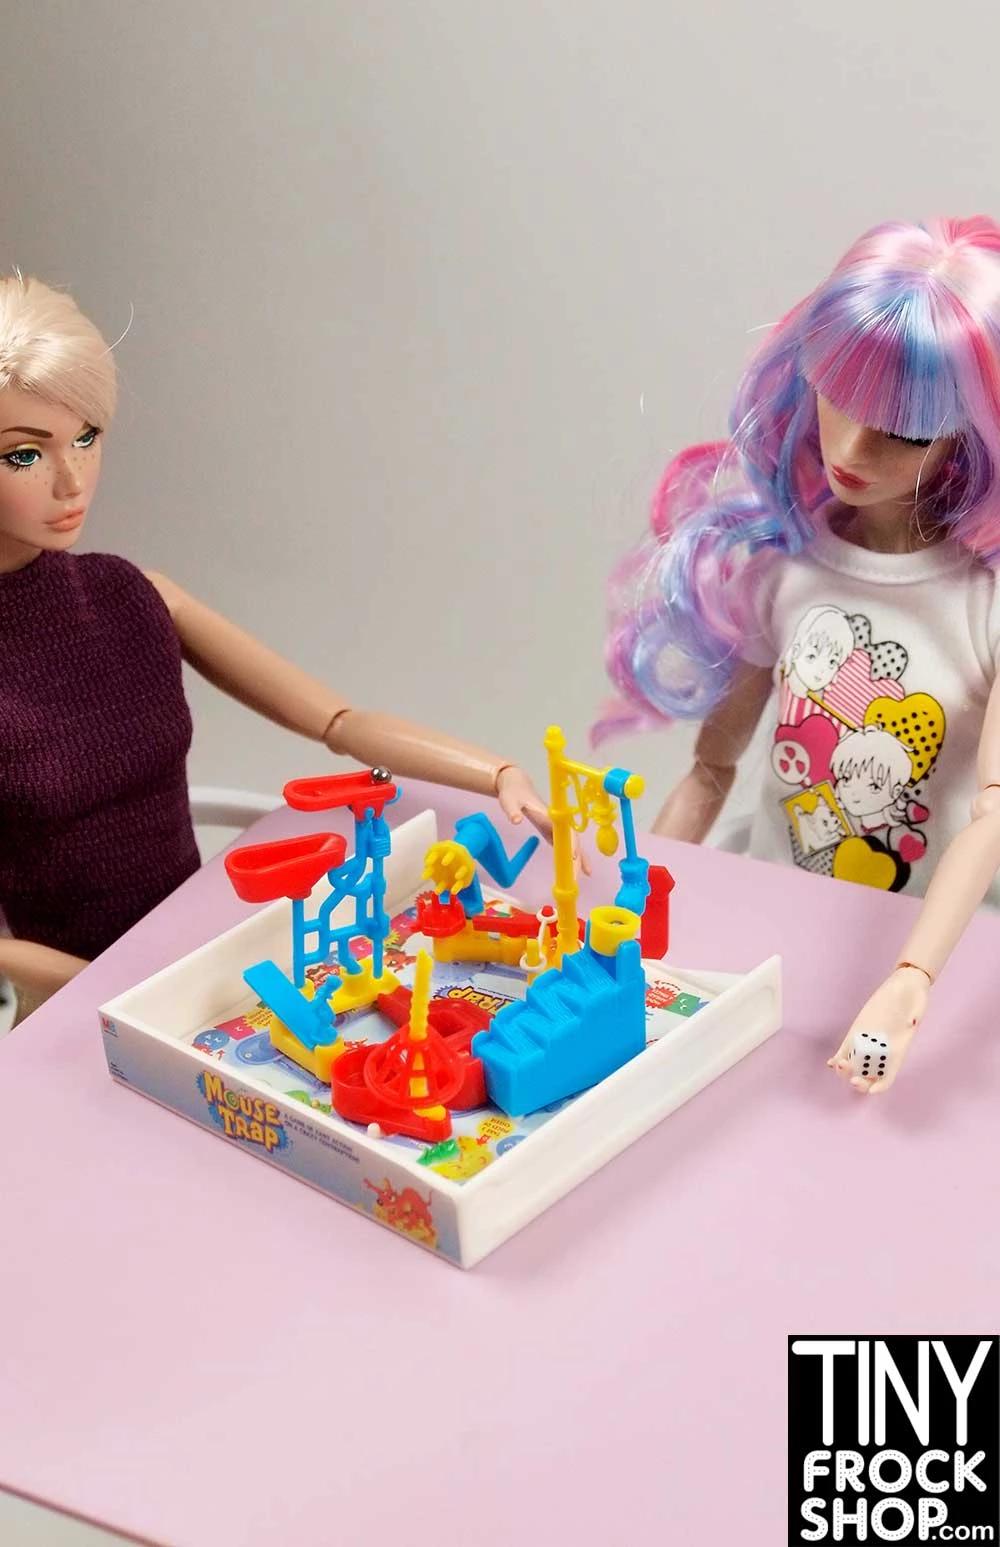 Barbie Milton Bradley Mini Mouse Trap Game #mousetrap Tiny Frock Shop Barbie Milton Bradley Mini Mouse Trap Game #mousetrap